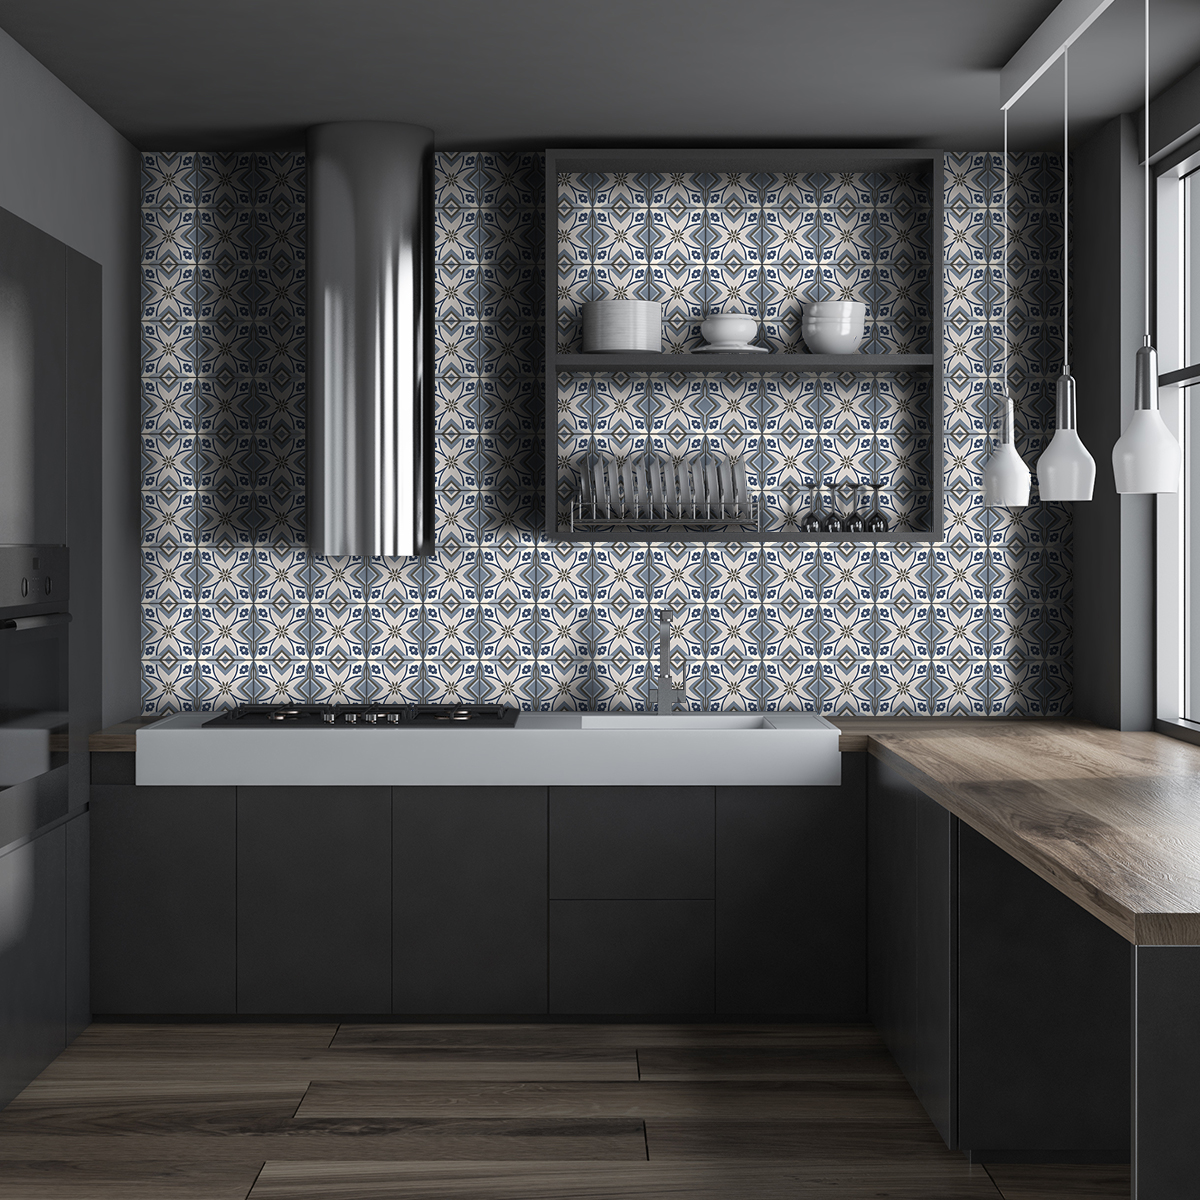 60 stickers carreaux de ciment azulejos lo lina cuisine. Black Bedroom Furniture Sets. Home Design Ideas